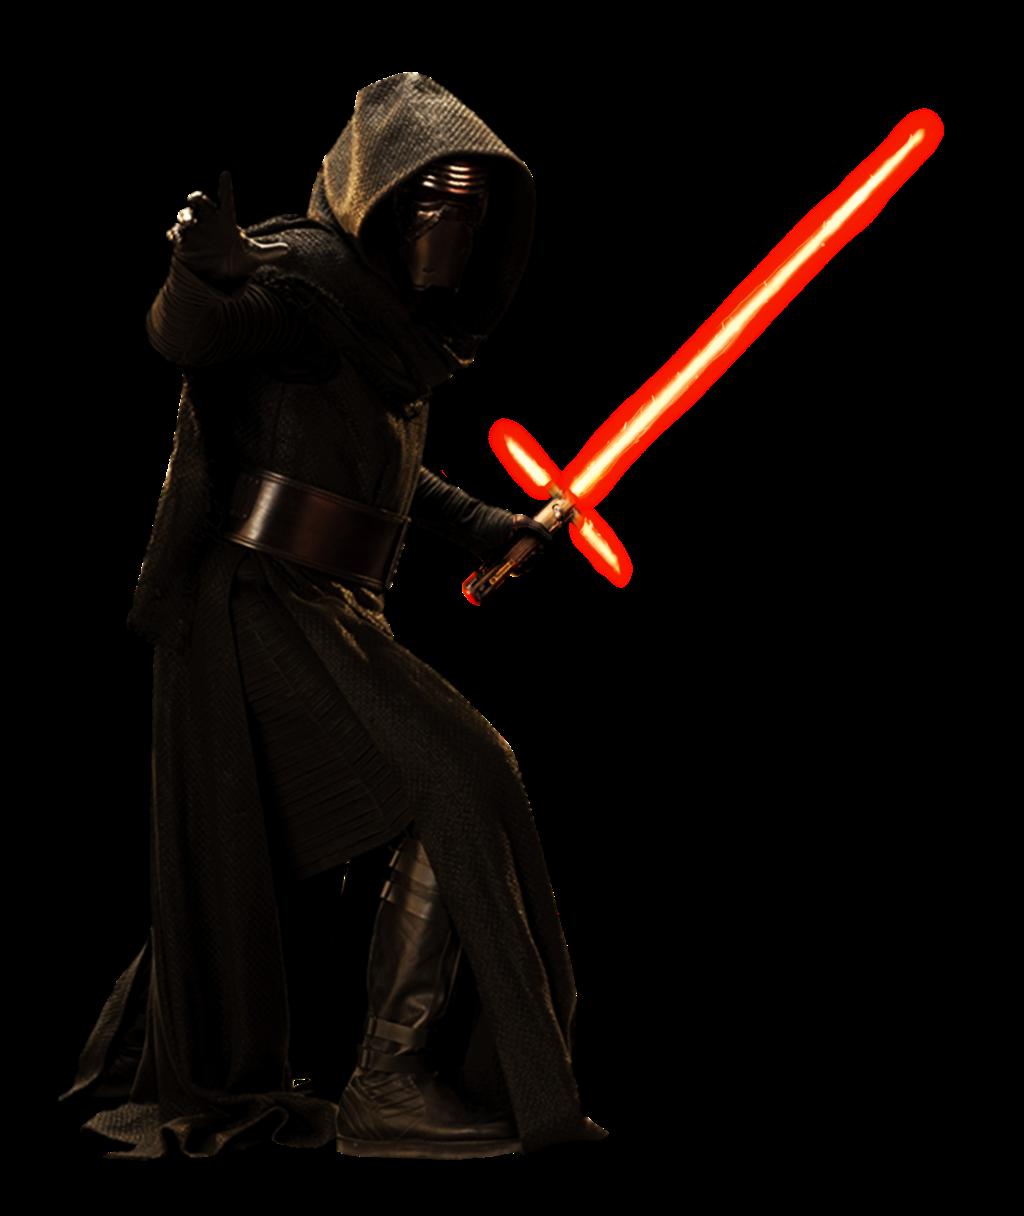 PNG Kylo Ren (Star Wars, The Last Jedi, Force Awakens).